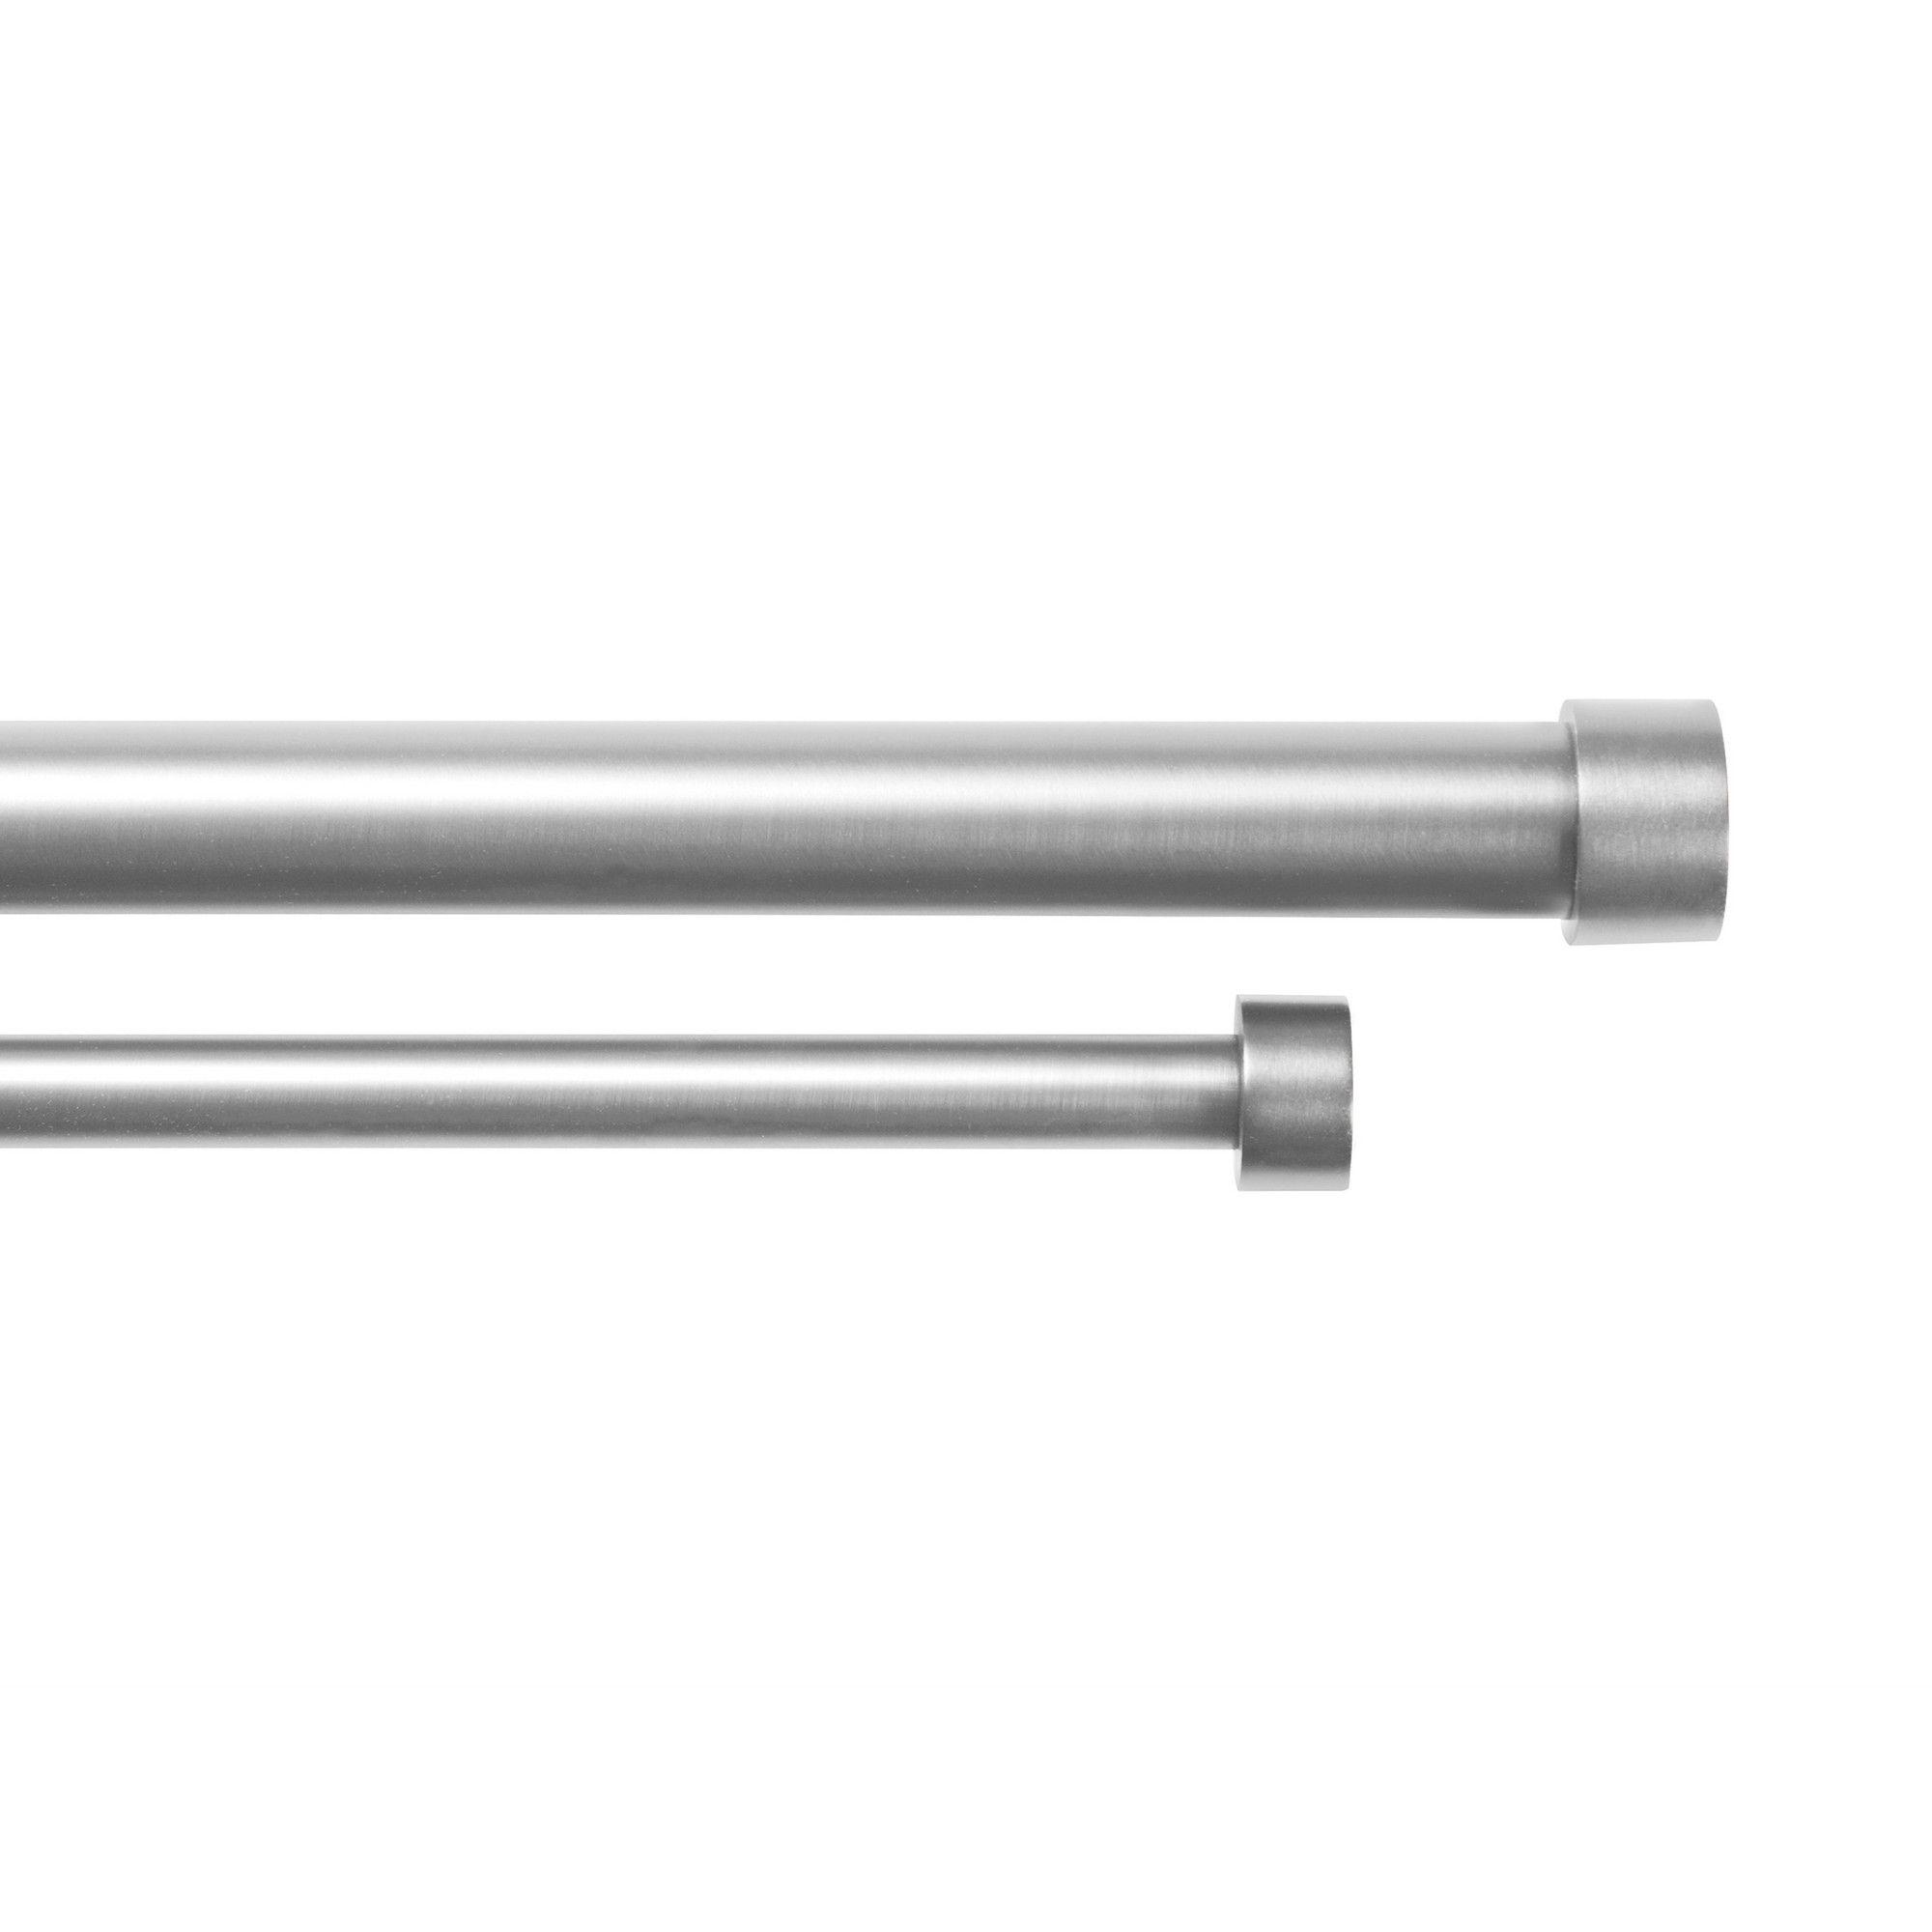 Umbra Cappa Double Drapery Rod Set Nickel 72-144, Silver